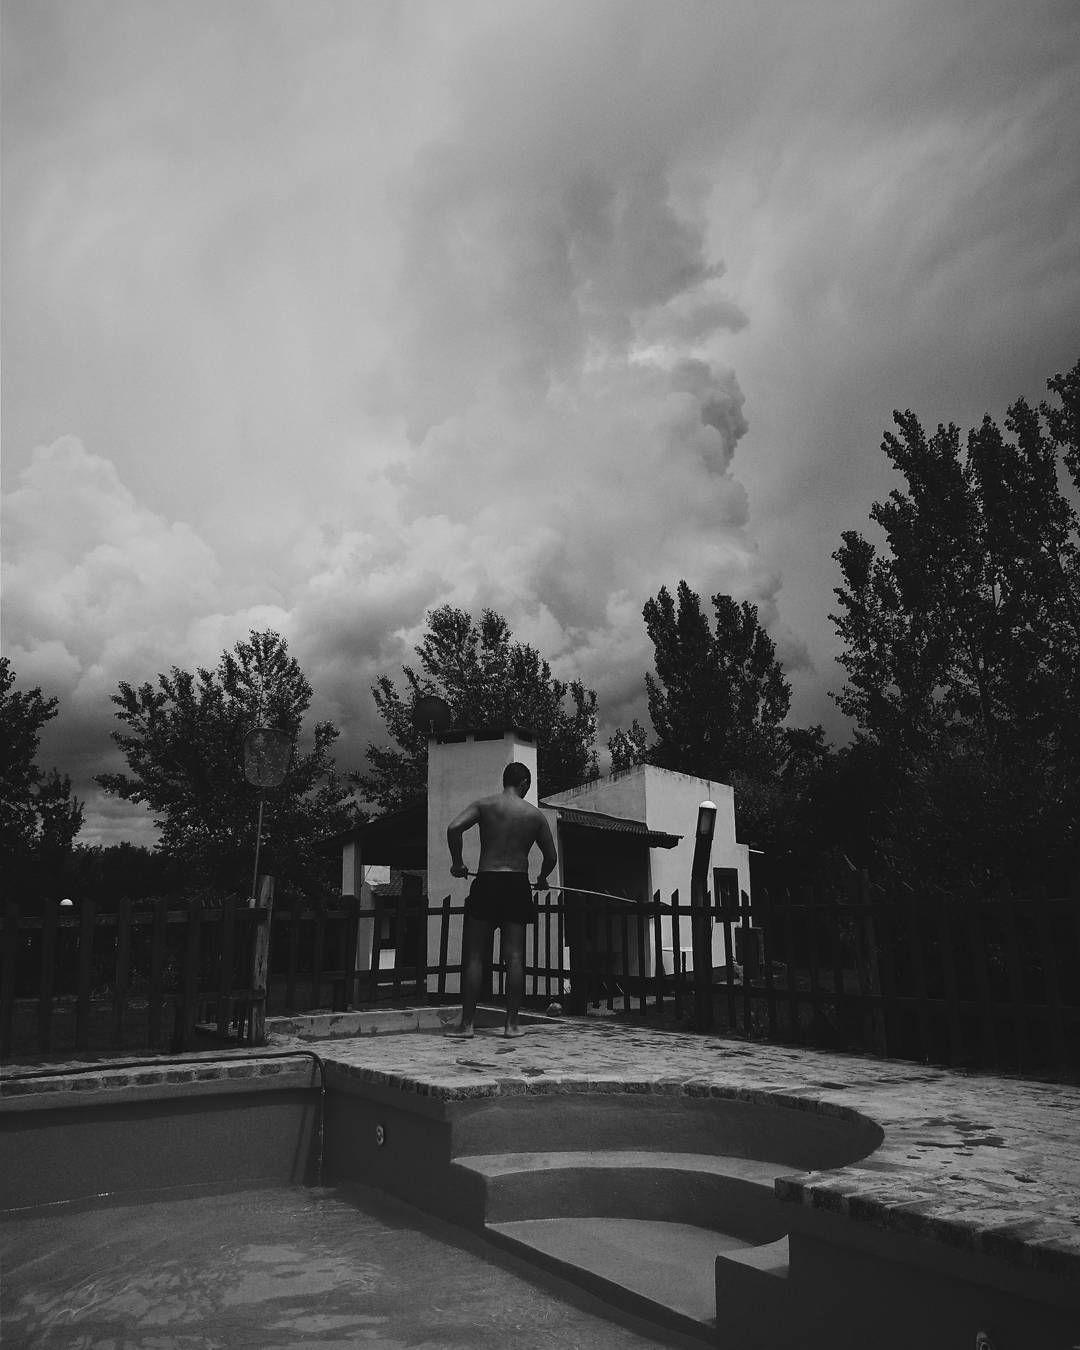 On instagram by romgarmaz_ushuaia #landscape #contratahotel (o) http://ift.tt/1JWjEBD #storm #tormenta #vacaciones #valle #lagosanroque #love #instapeople #cordoba #paisajes #verano #veranoenargentina #vsco #argentinamia #adisfrutareldia